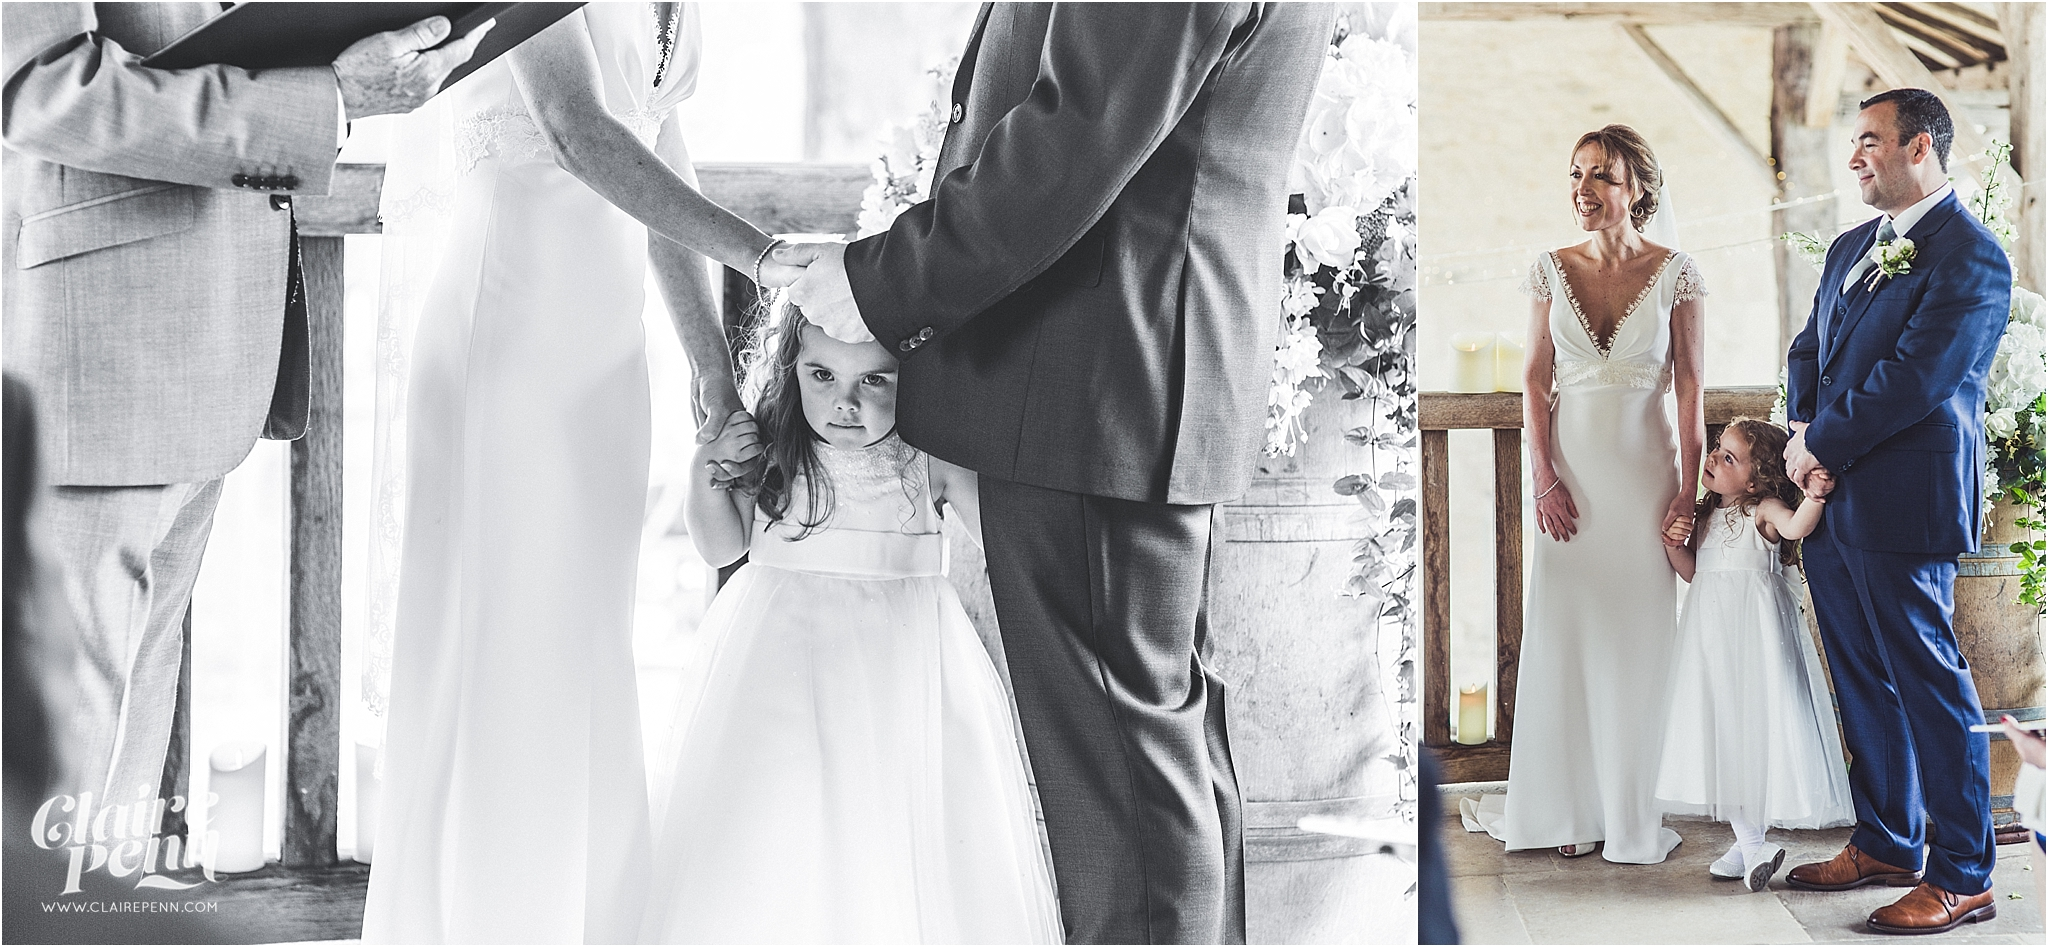 Elegant Domaine chateau wedding France00055.jpg